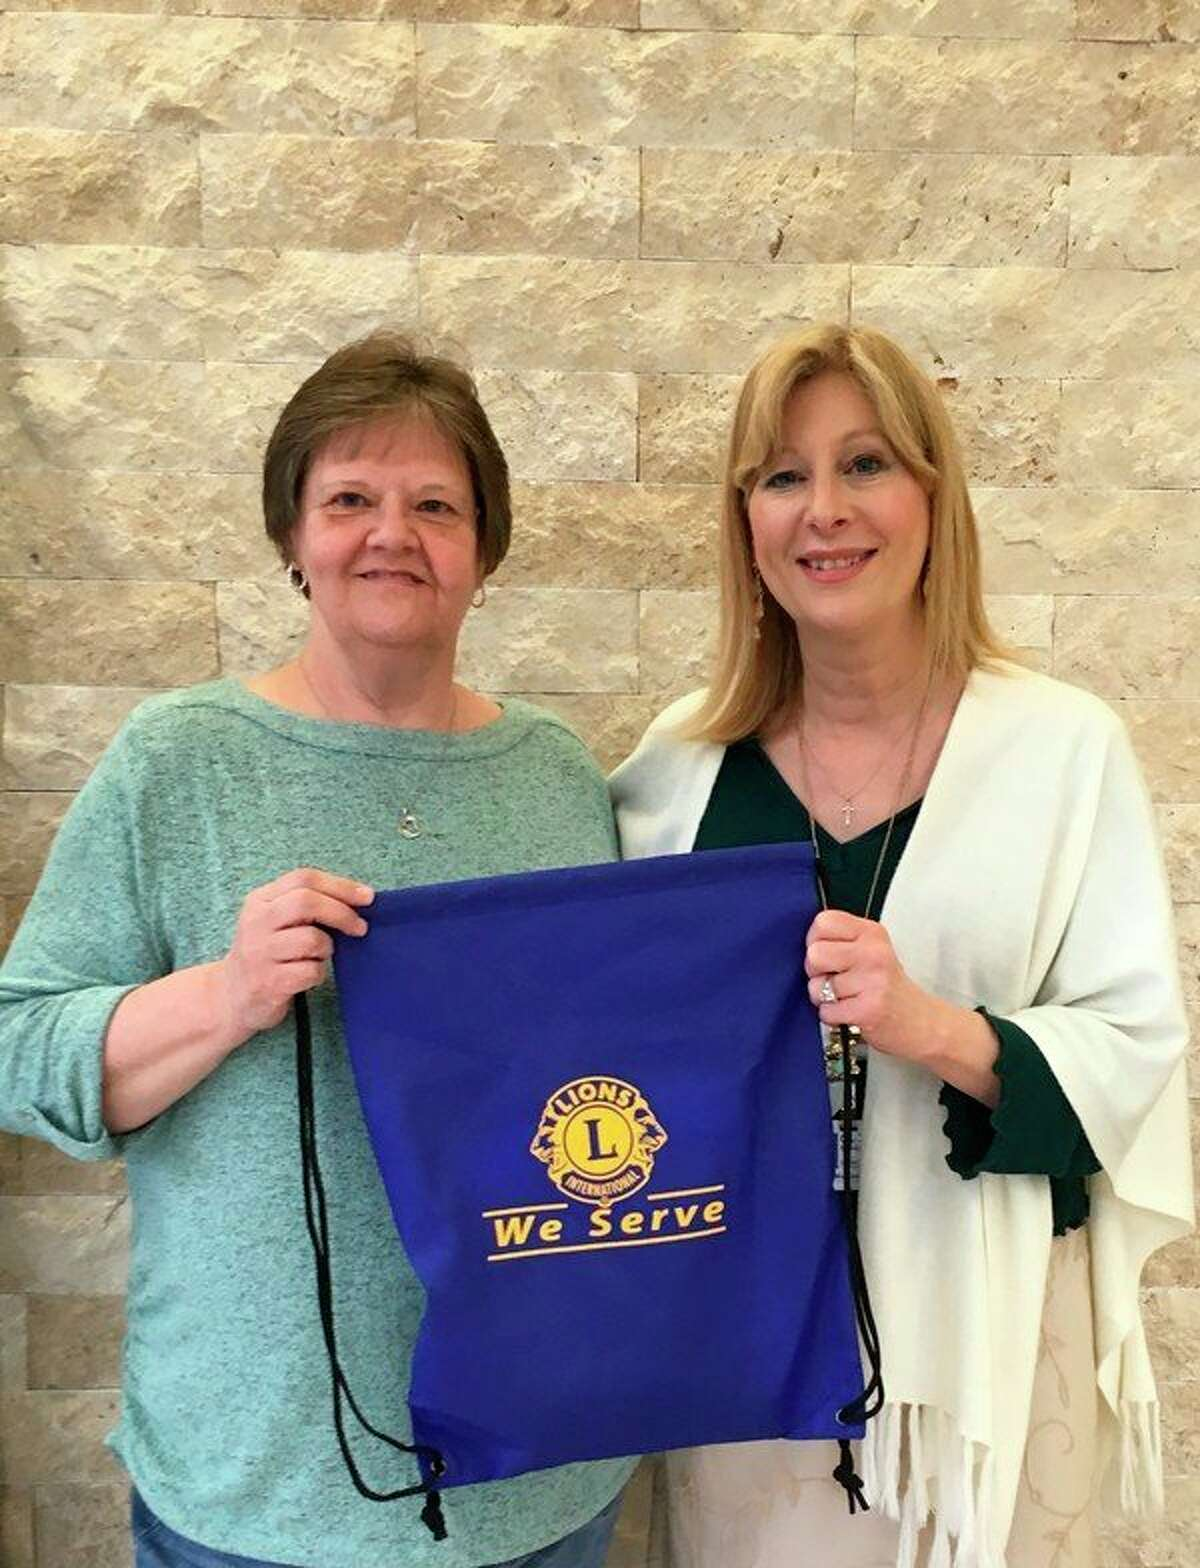 Carlene Skorczewski, manager of MidMichigan Health Foundation, accepts Lions Club hospital bags for children from Shiela Ferrel. (Photo provided)